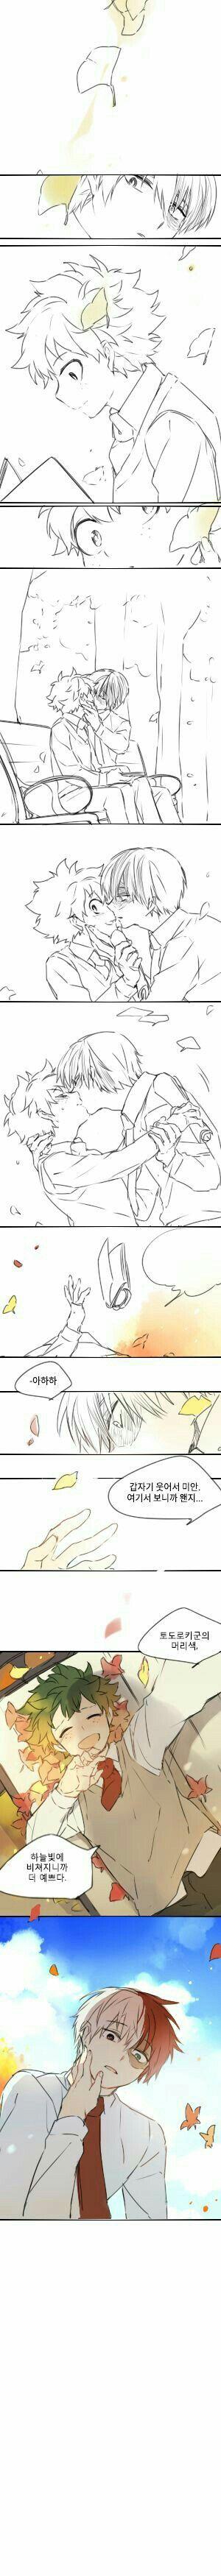 Pin on Boku no Hero Academia/My Hero Academia 僕 の ヒーロー